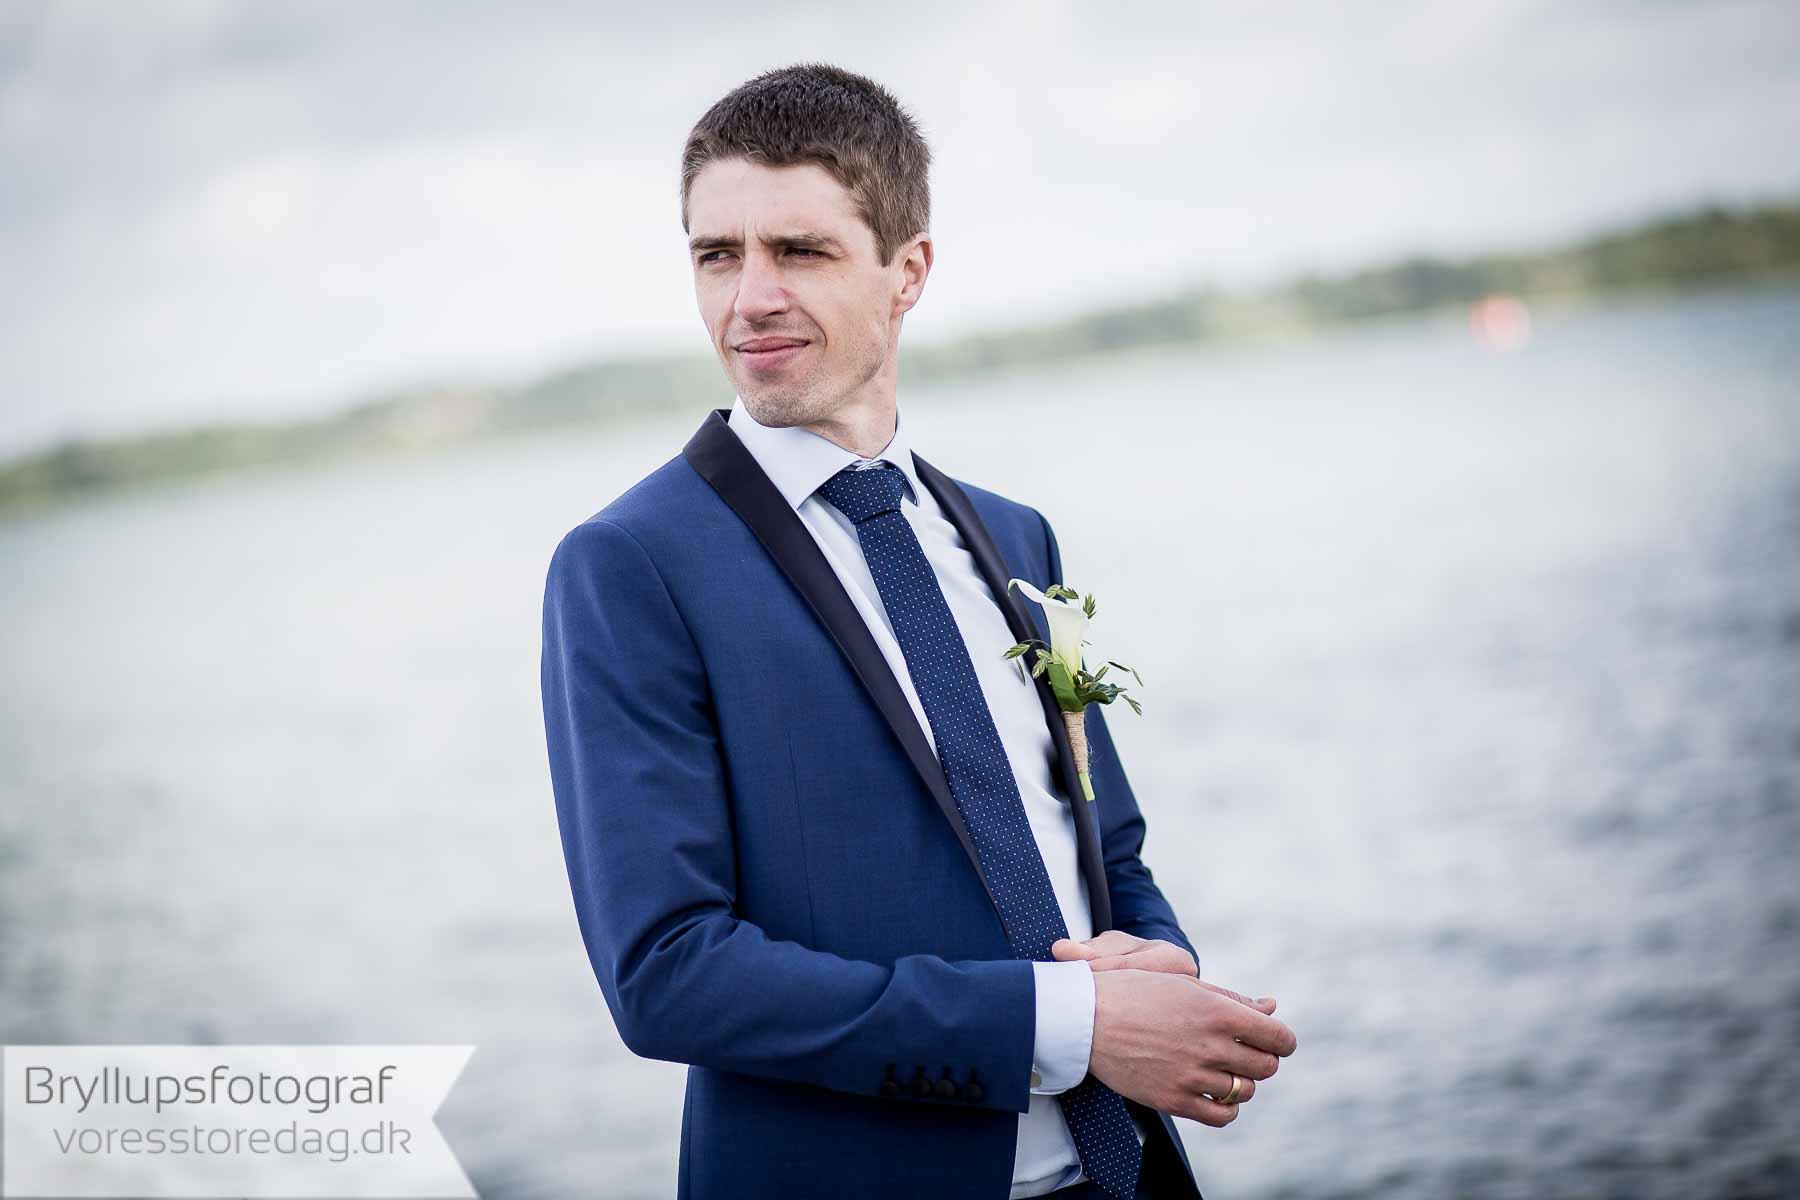 Billeder og inspiration fra bryllupper